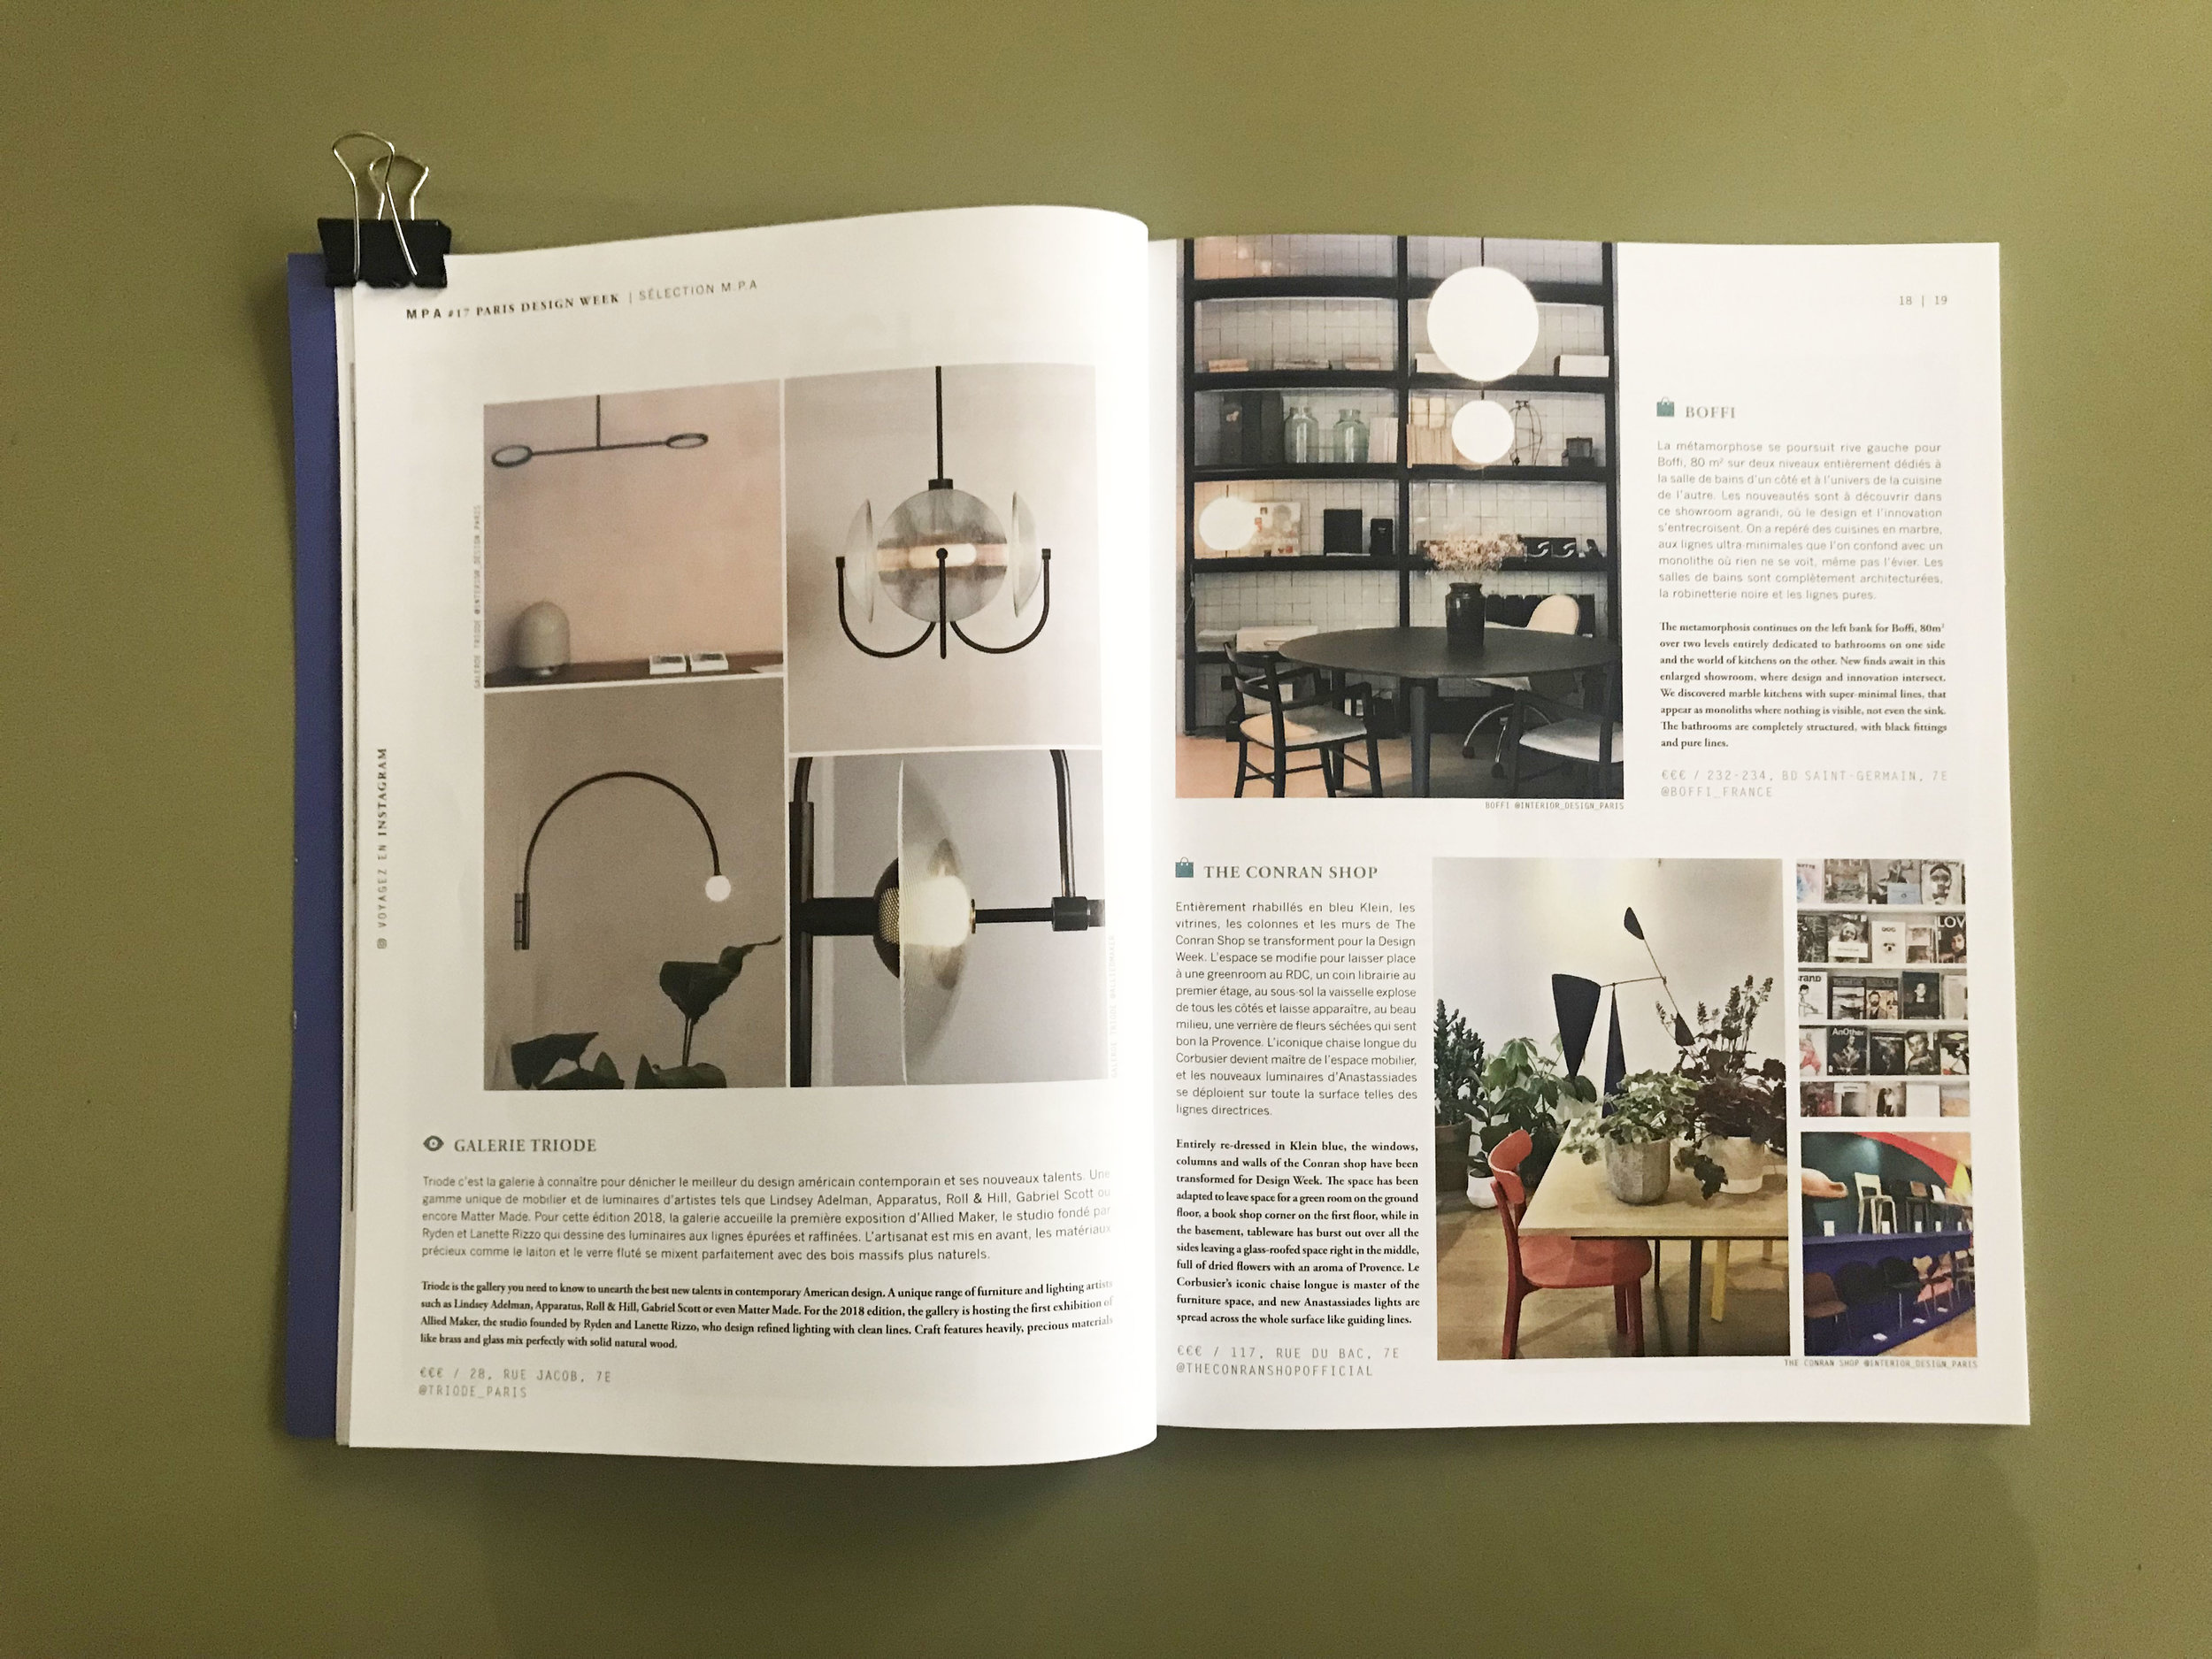 Interior_design_paris_week_merci_pour_l_adresse_3.jpg